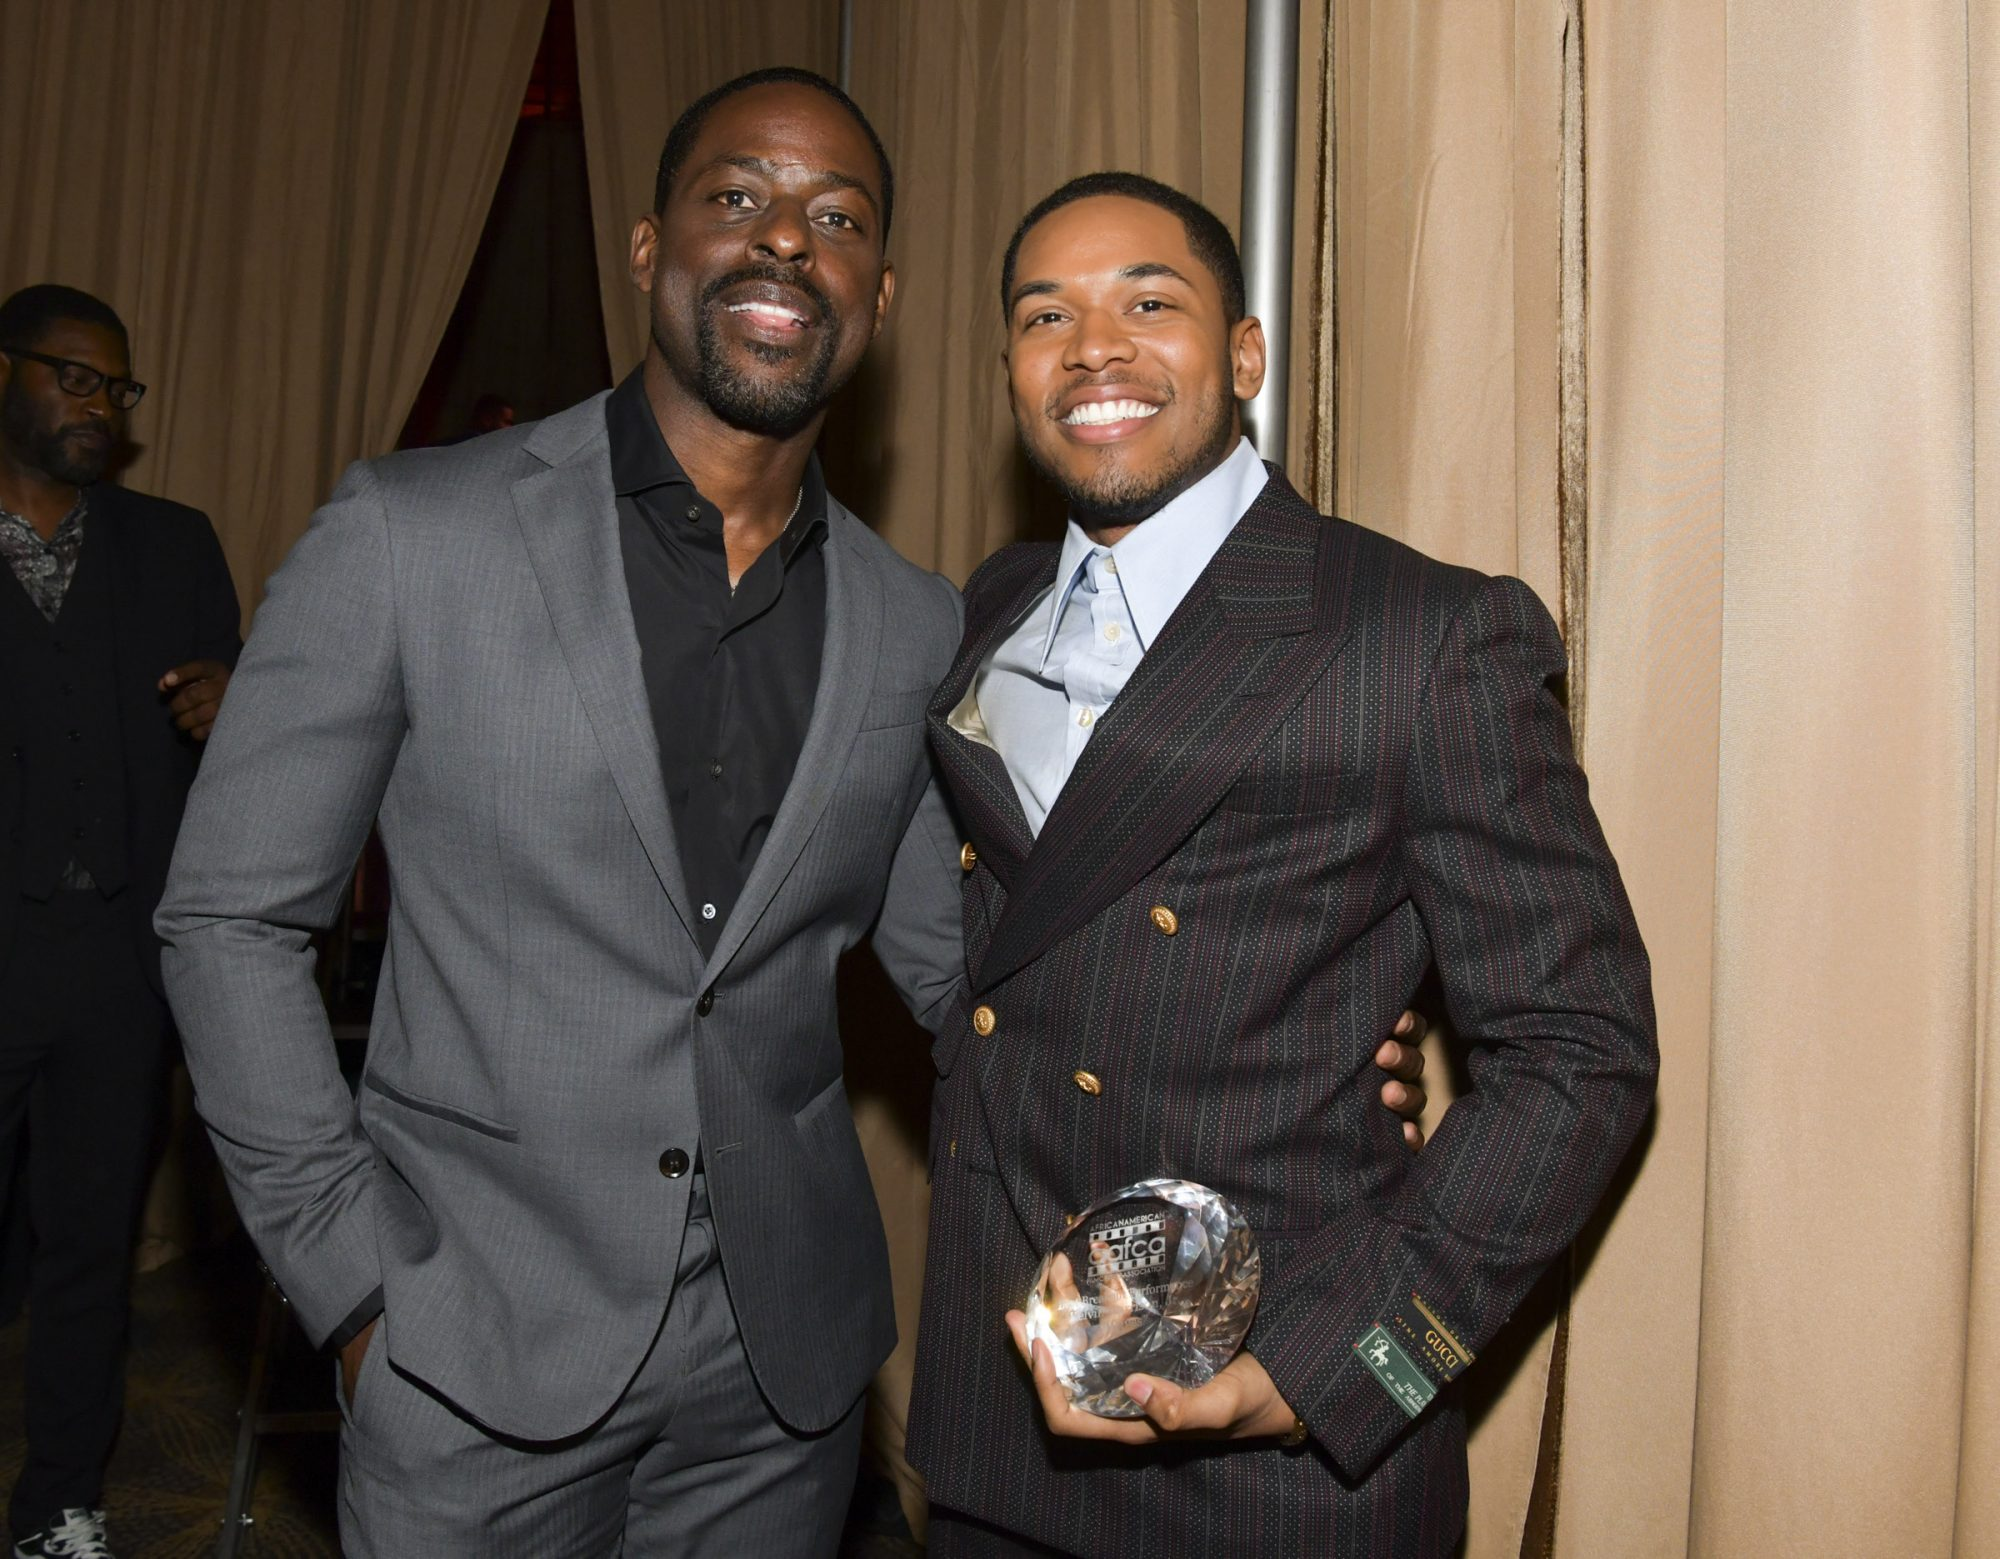 Sterling K. Brown and Kelvin Harrison Jr.